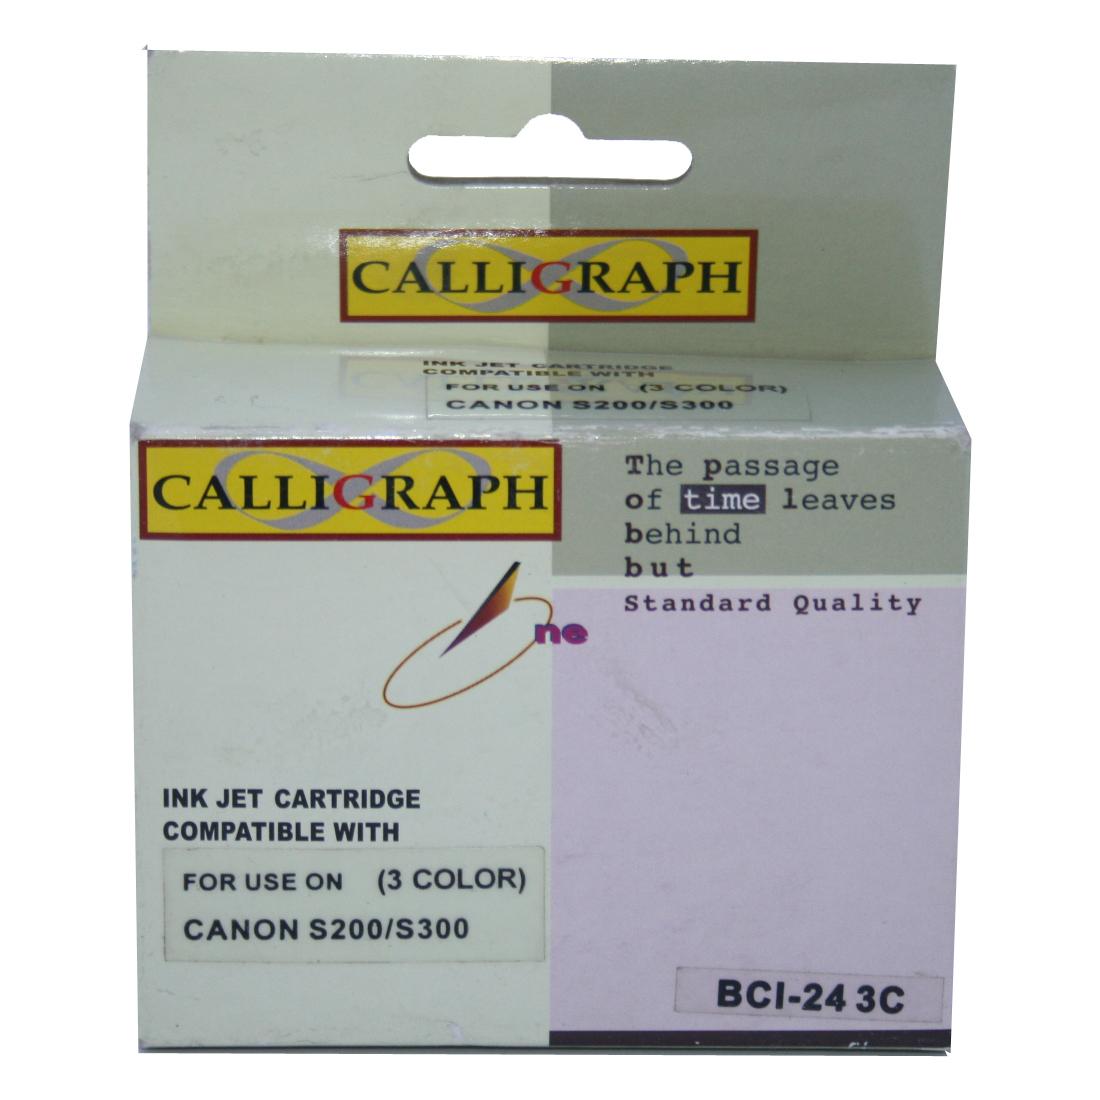 قیمت                      کارتریج رنگی کالیگراف مدل BCI-24 3C